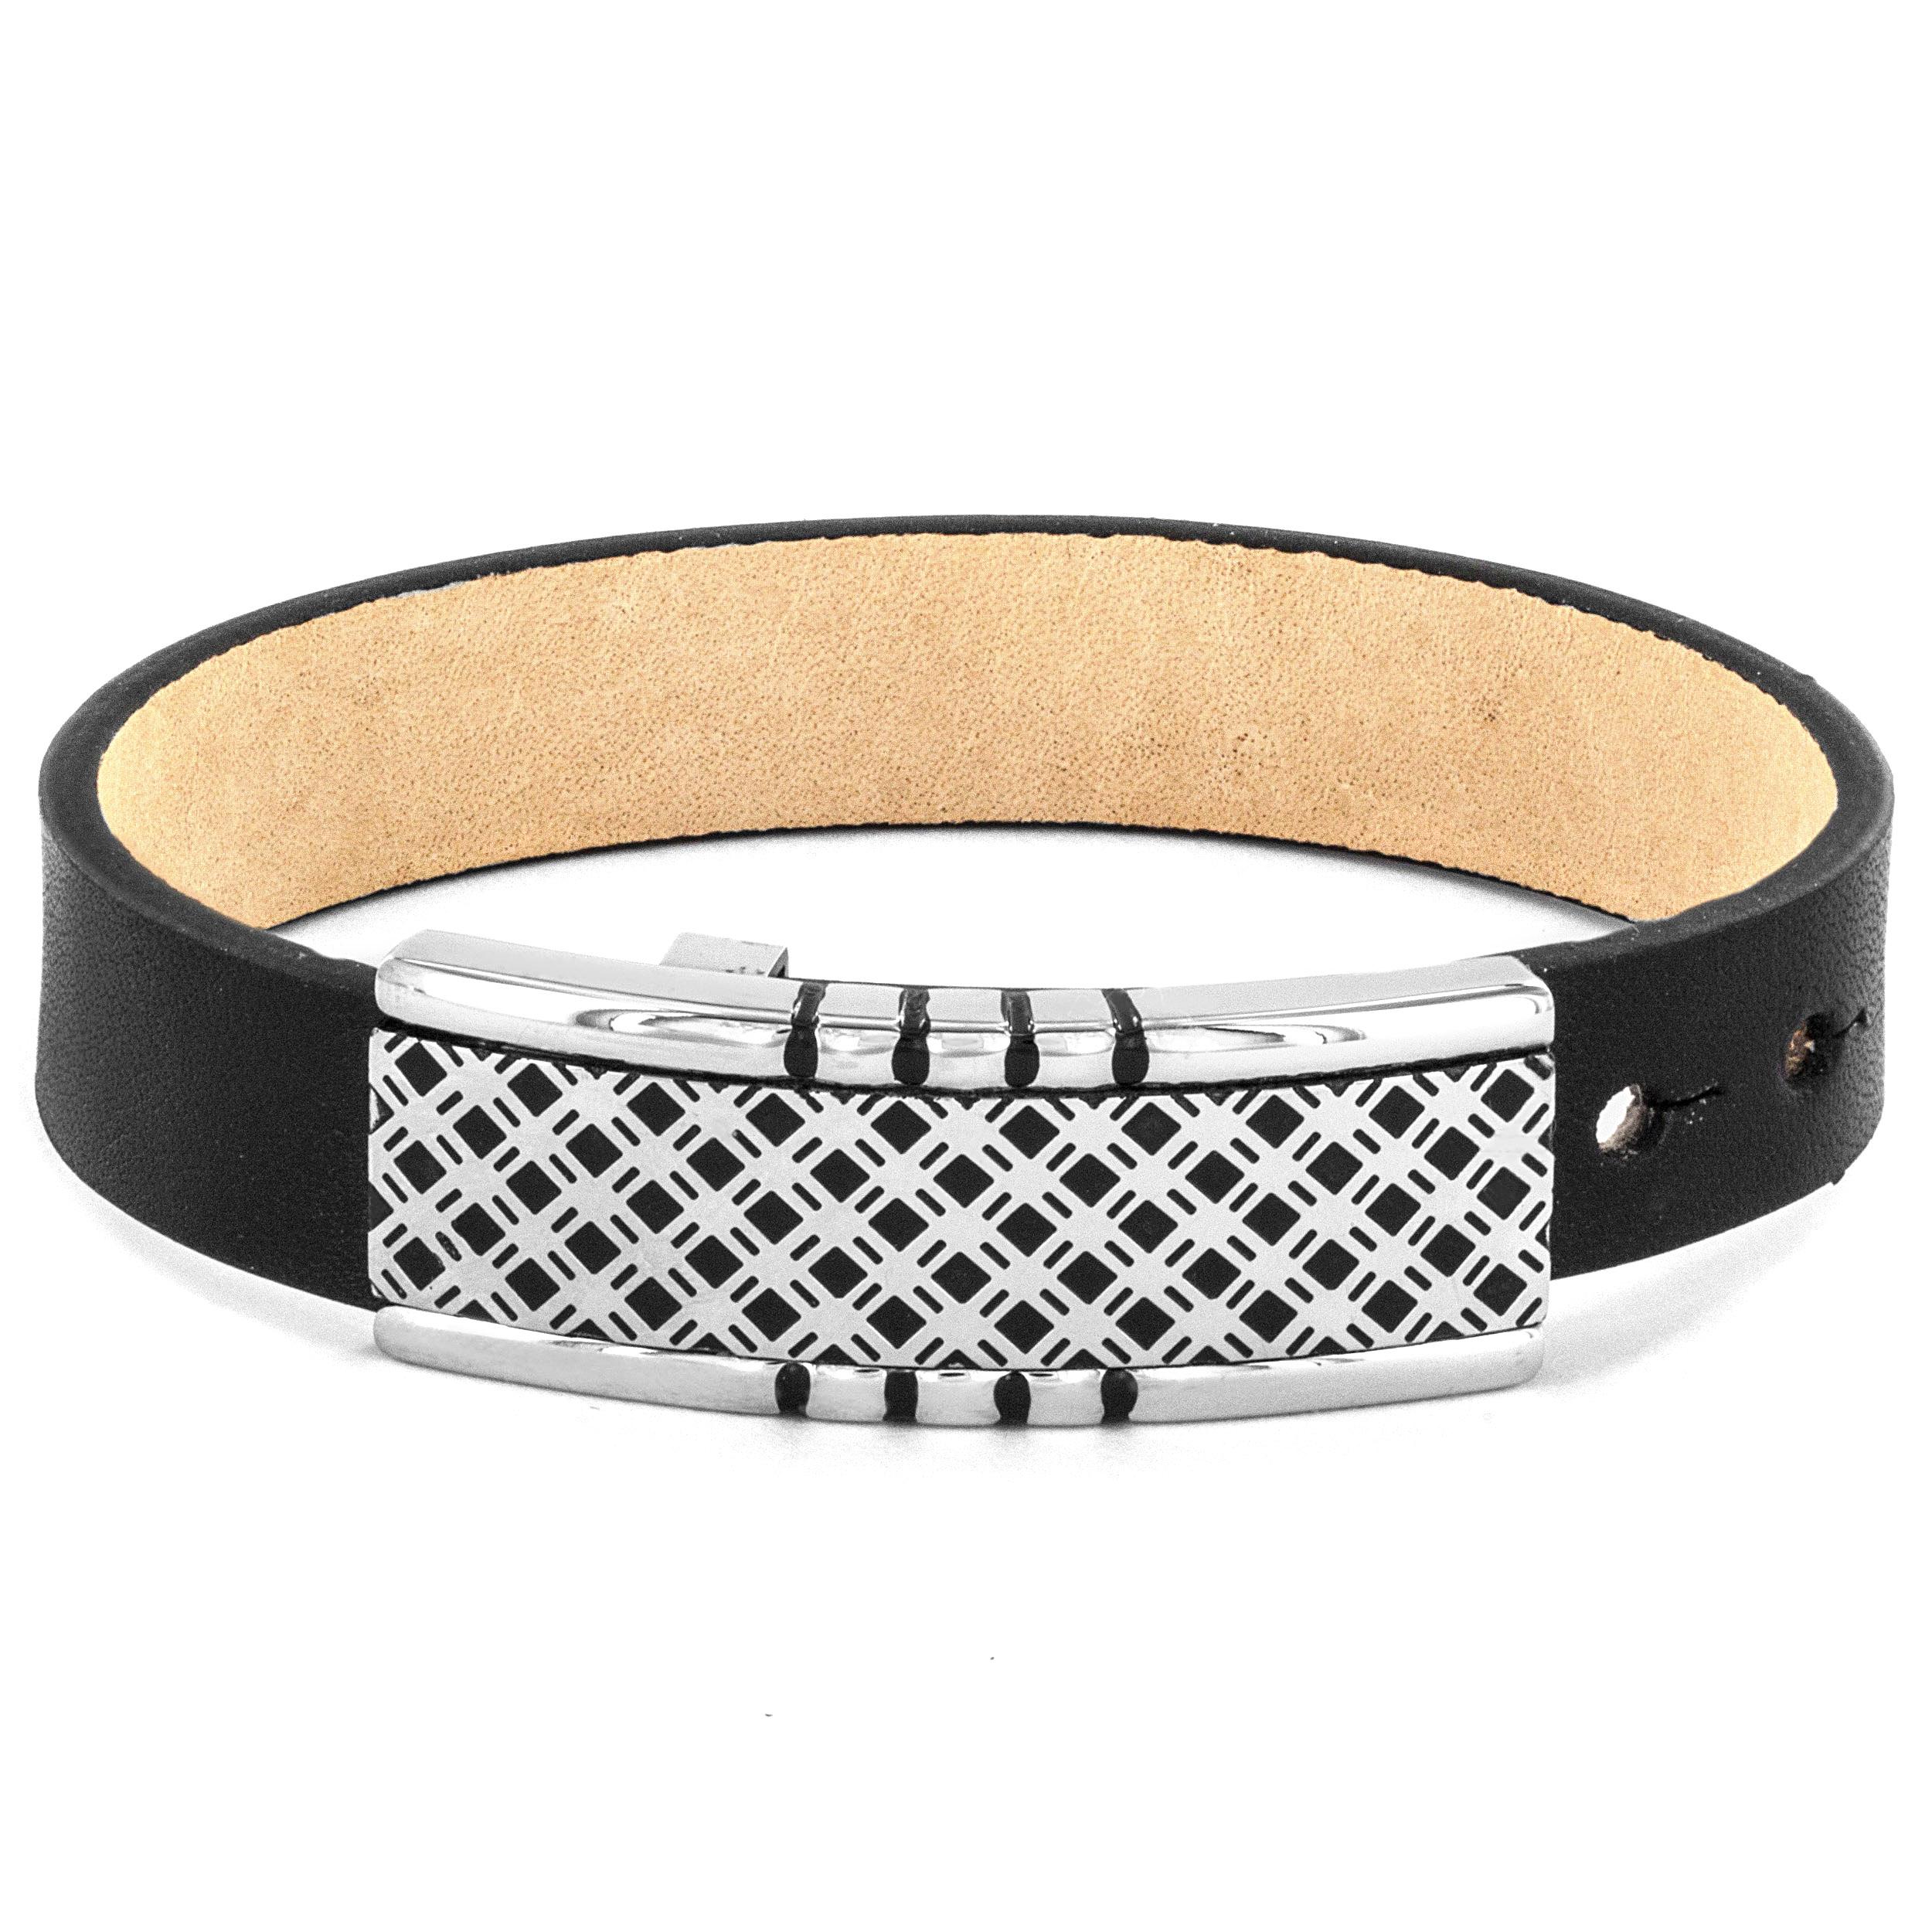 Crucible Black Leather and Lattice Buckle Bracelet, Men's